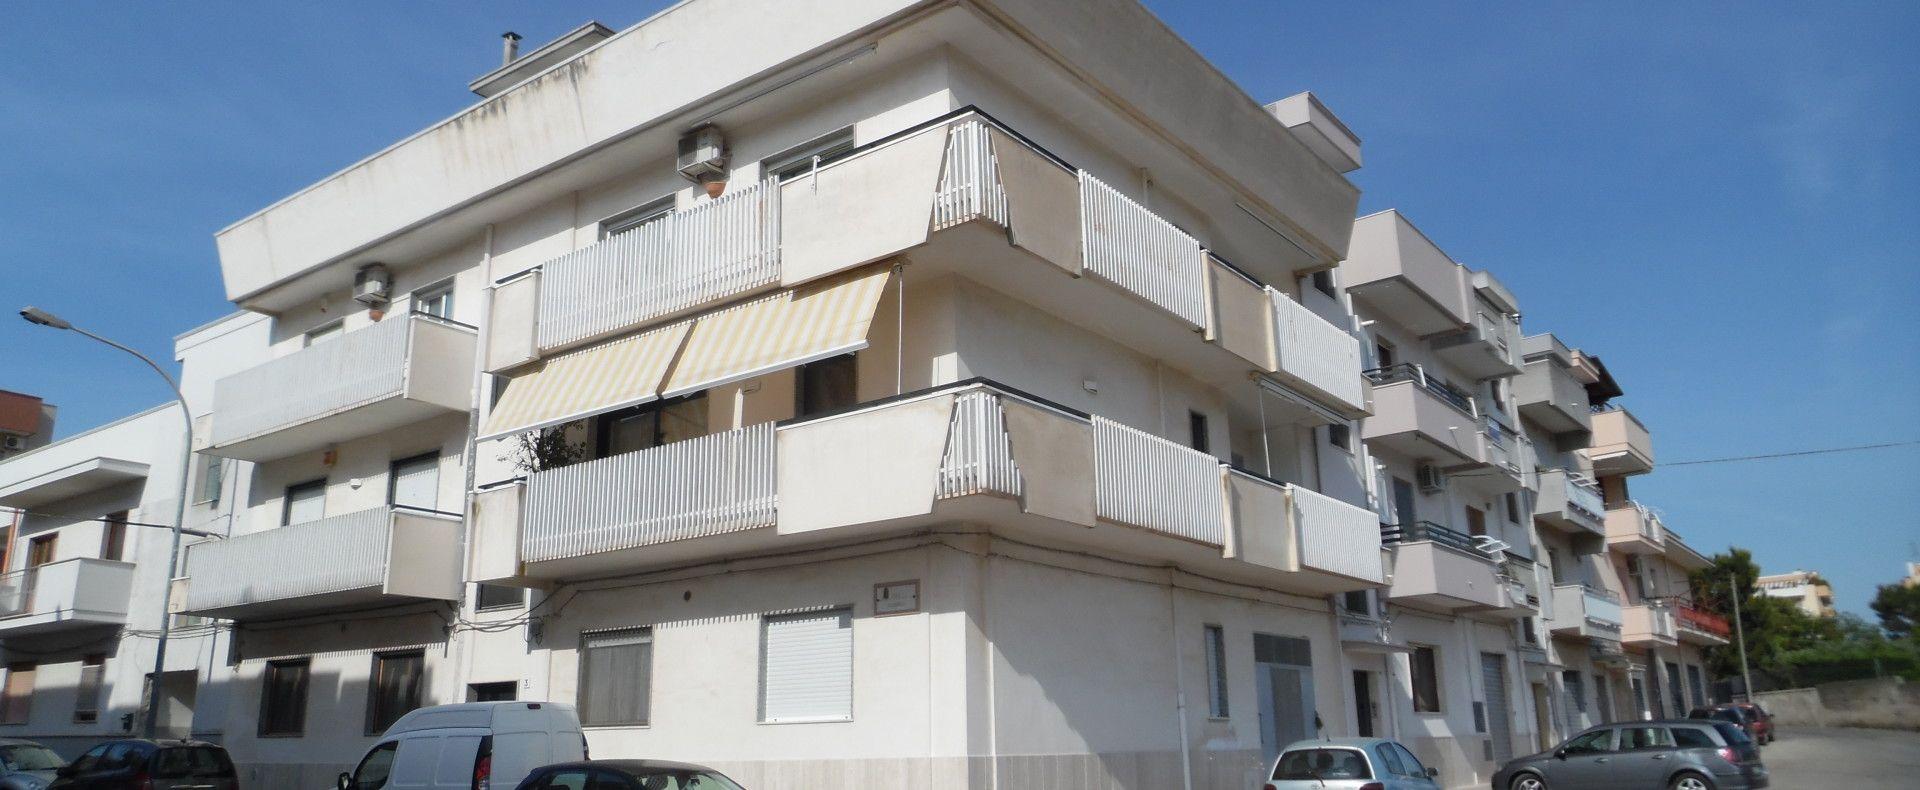 Rifinito appartamento via Fedro Grottaglie